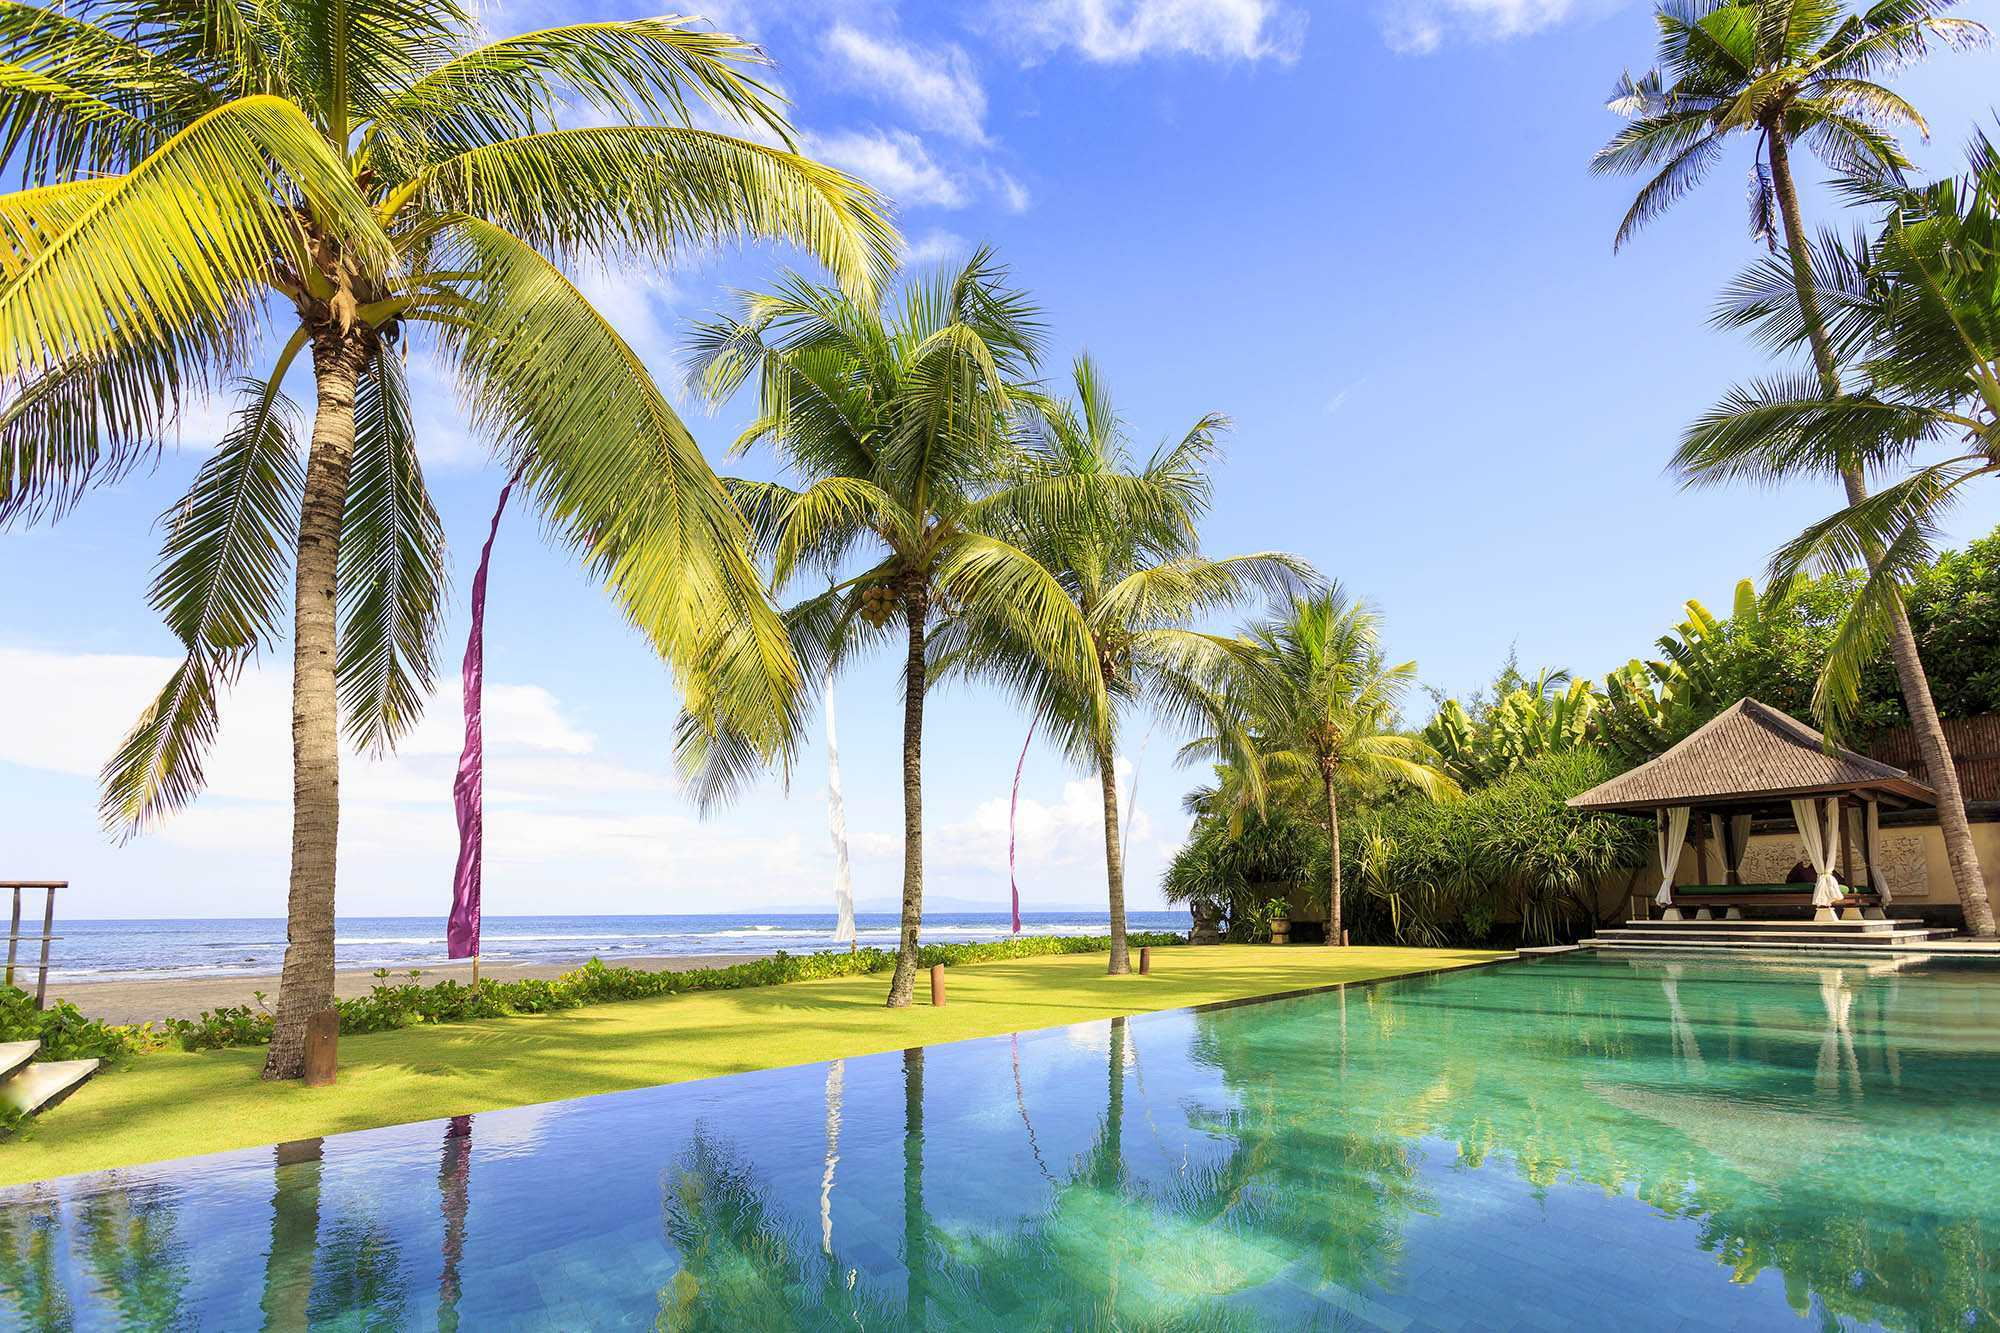 Agung Budi Raharsa | Architecture & Engineering Pushpapuri Villa - Bali Bali, Indonesia Bali, Indonesia Agung-Budi-Raharsa-Pushpapuri-Villa   88357